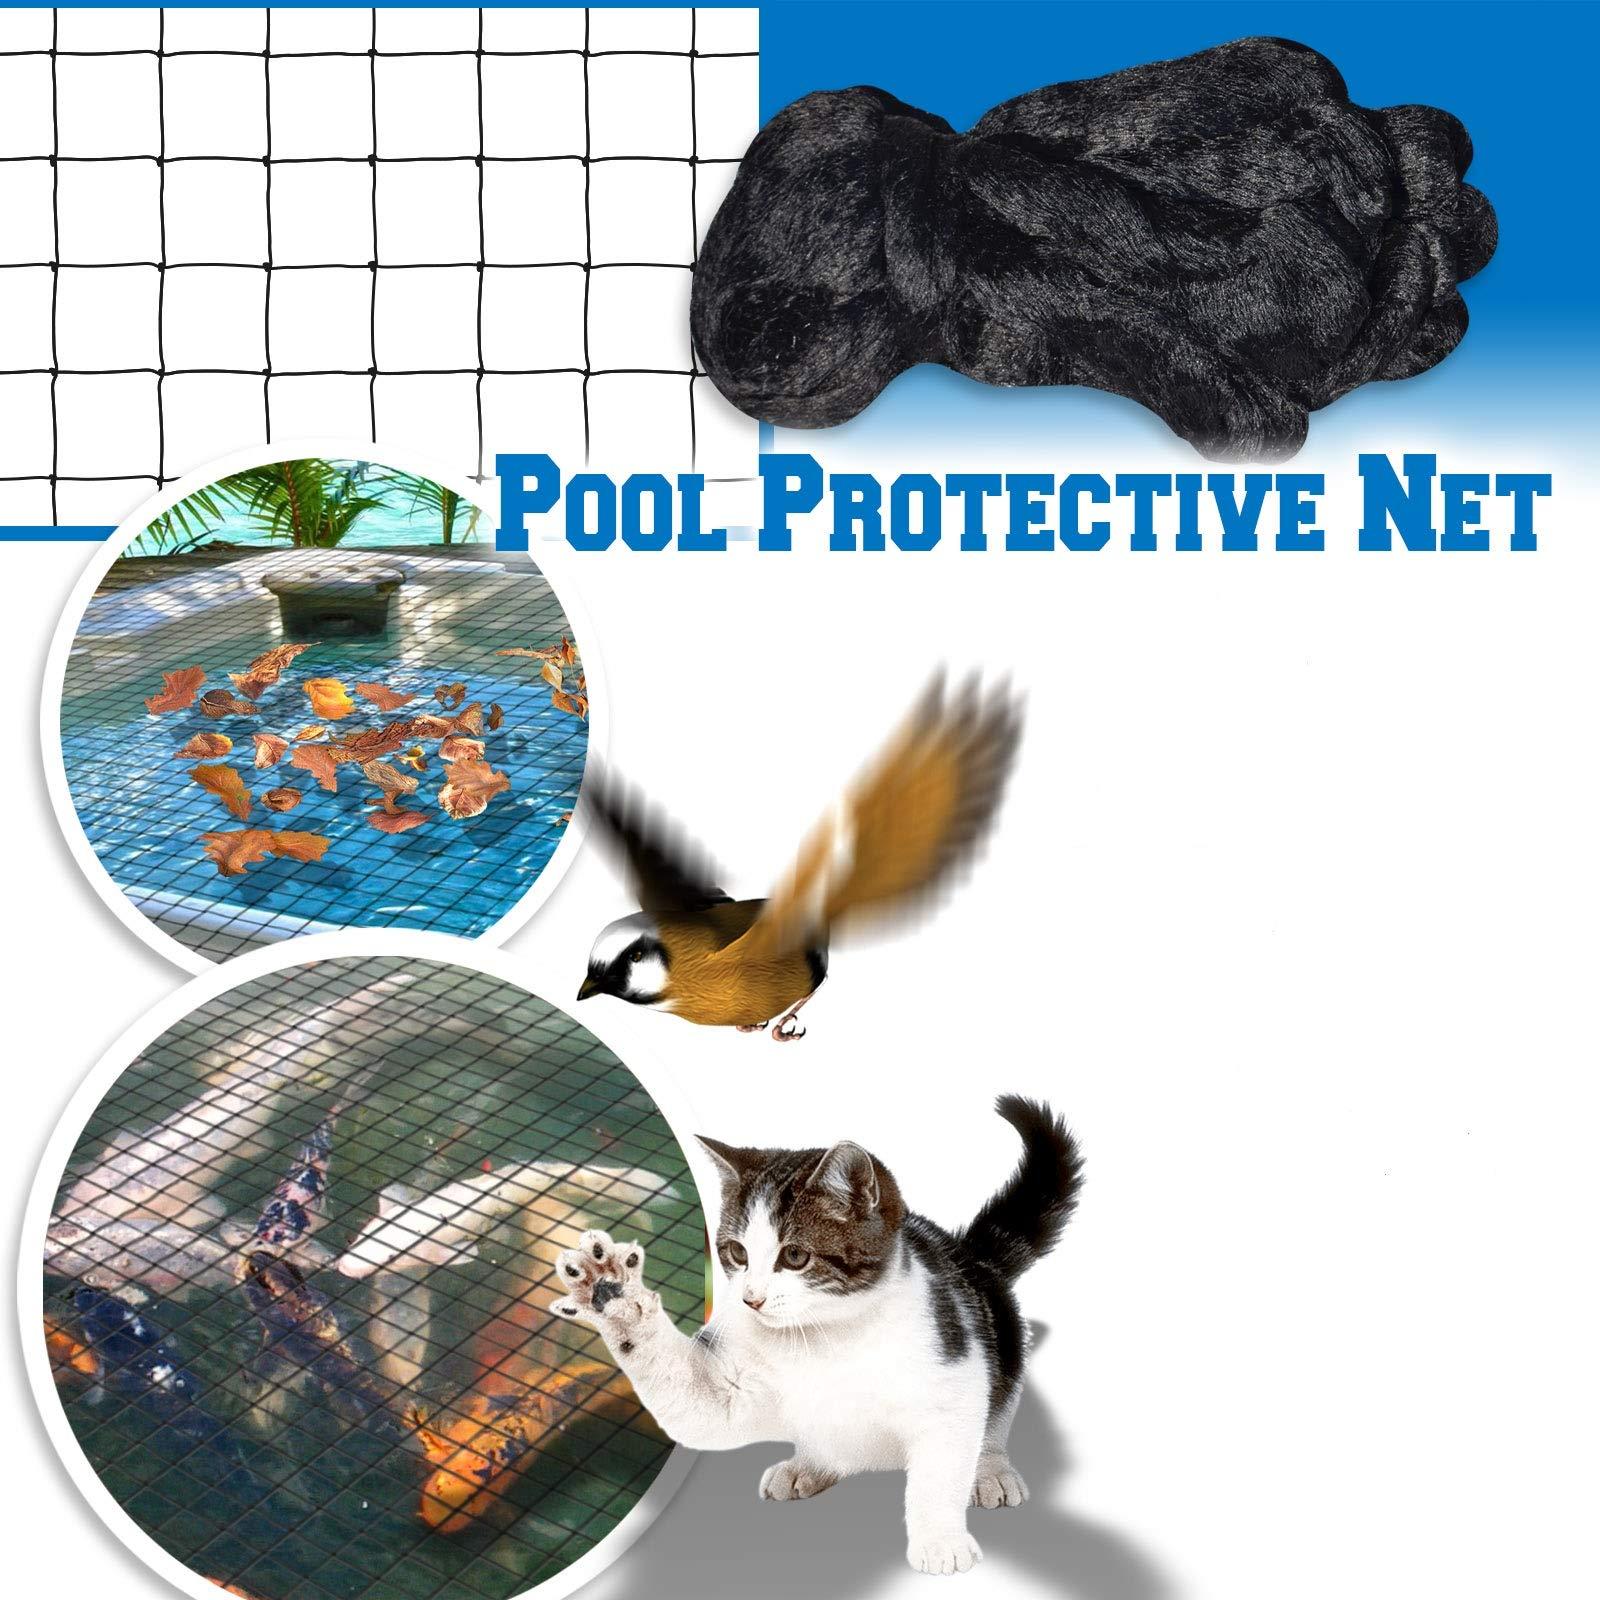 BenefitUSA Pool Netting Pond Protective Floating Net Tub Mesh Cover (28' x45') by BenefitUSA